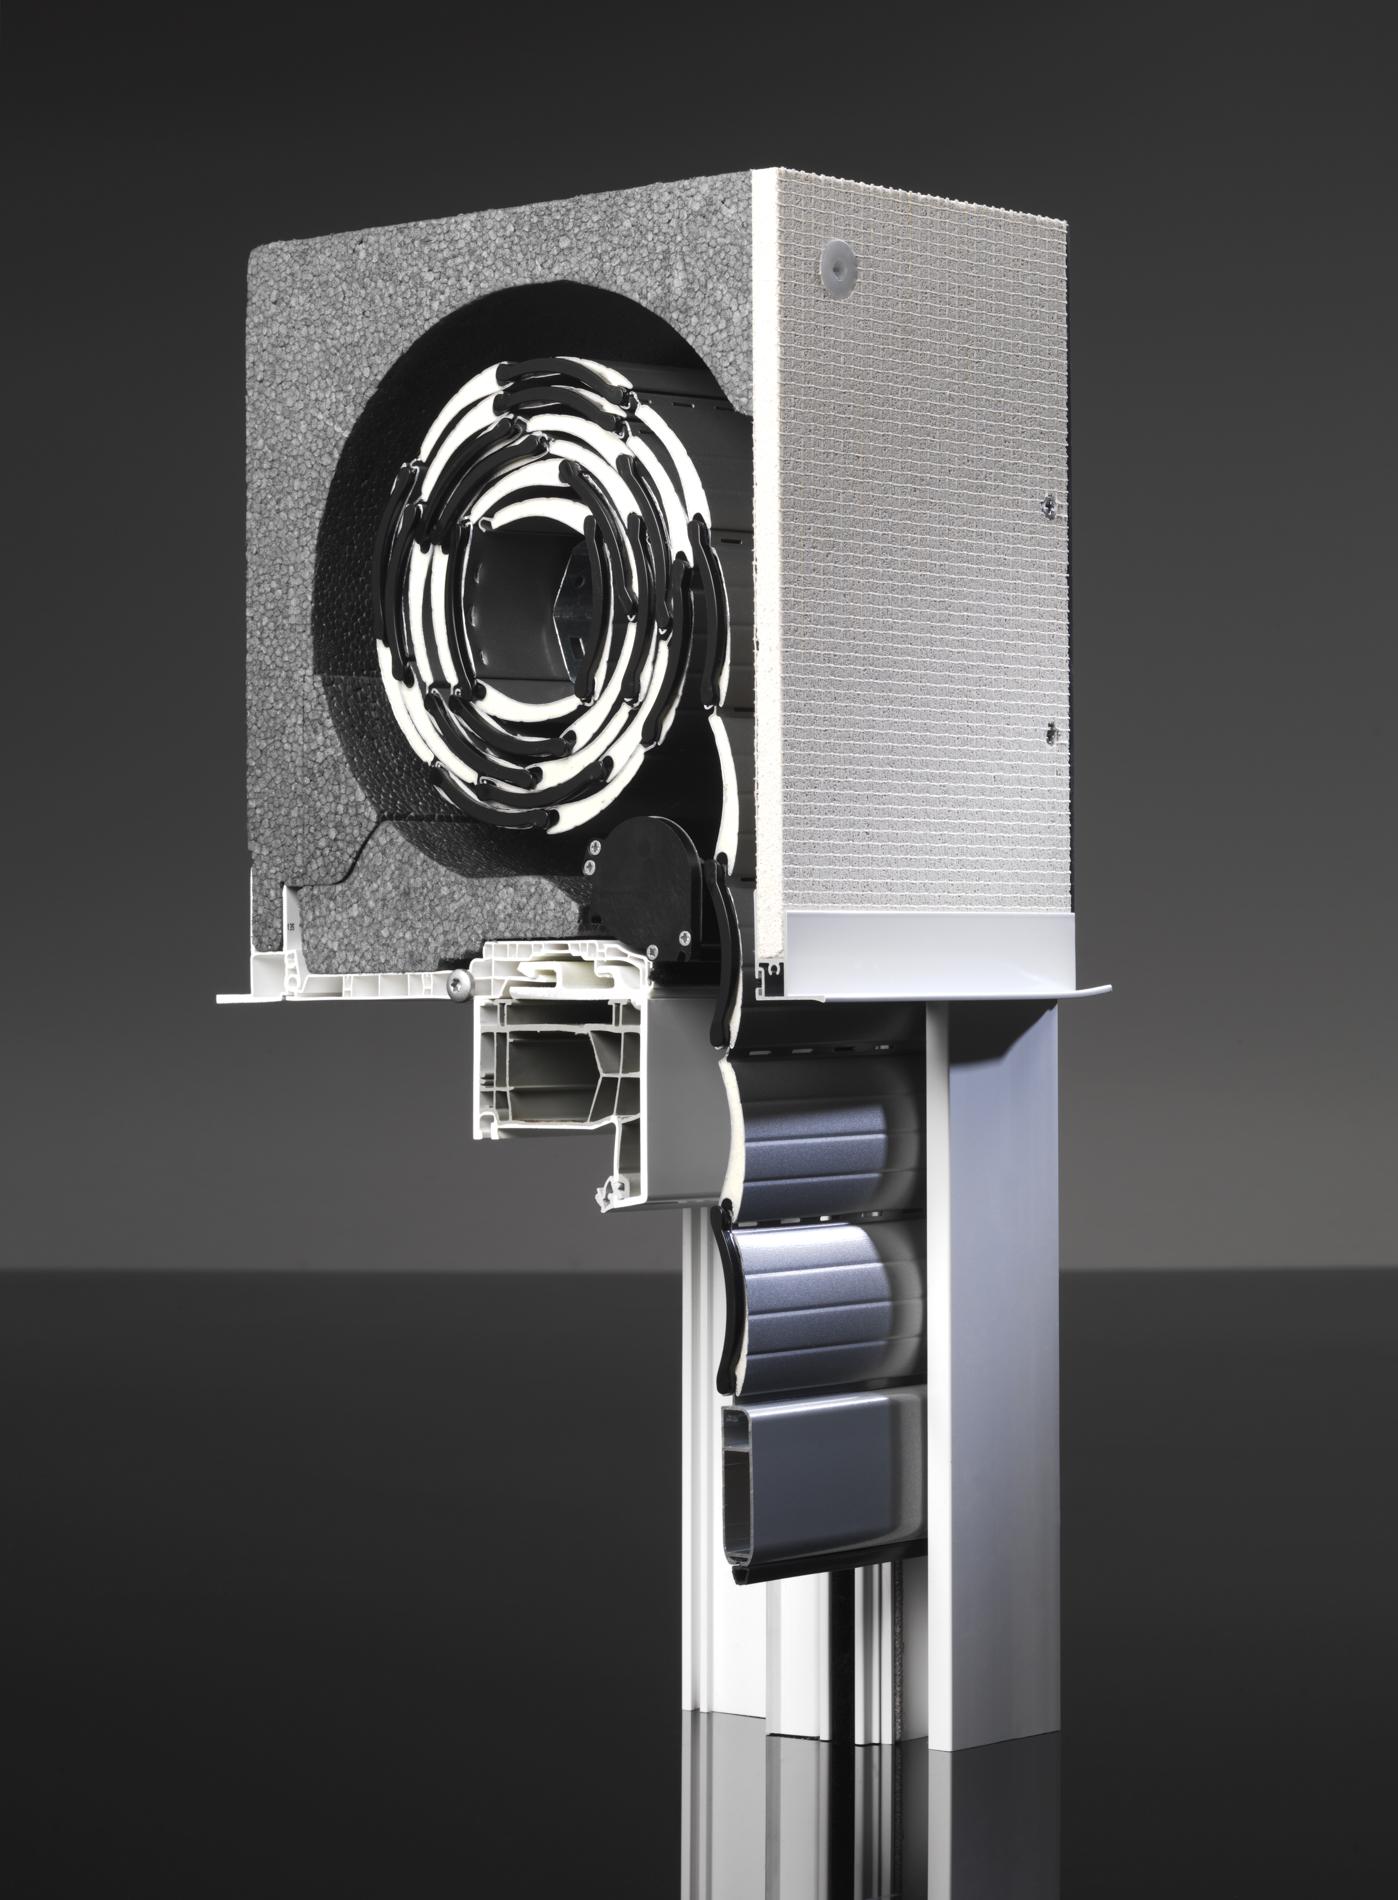 Enext RG/RO Rollladensystem - Aufsatzrollladen